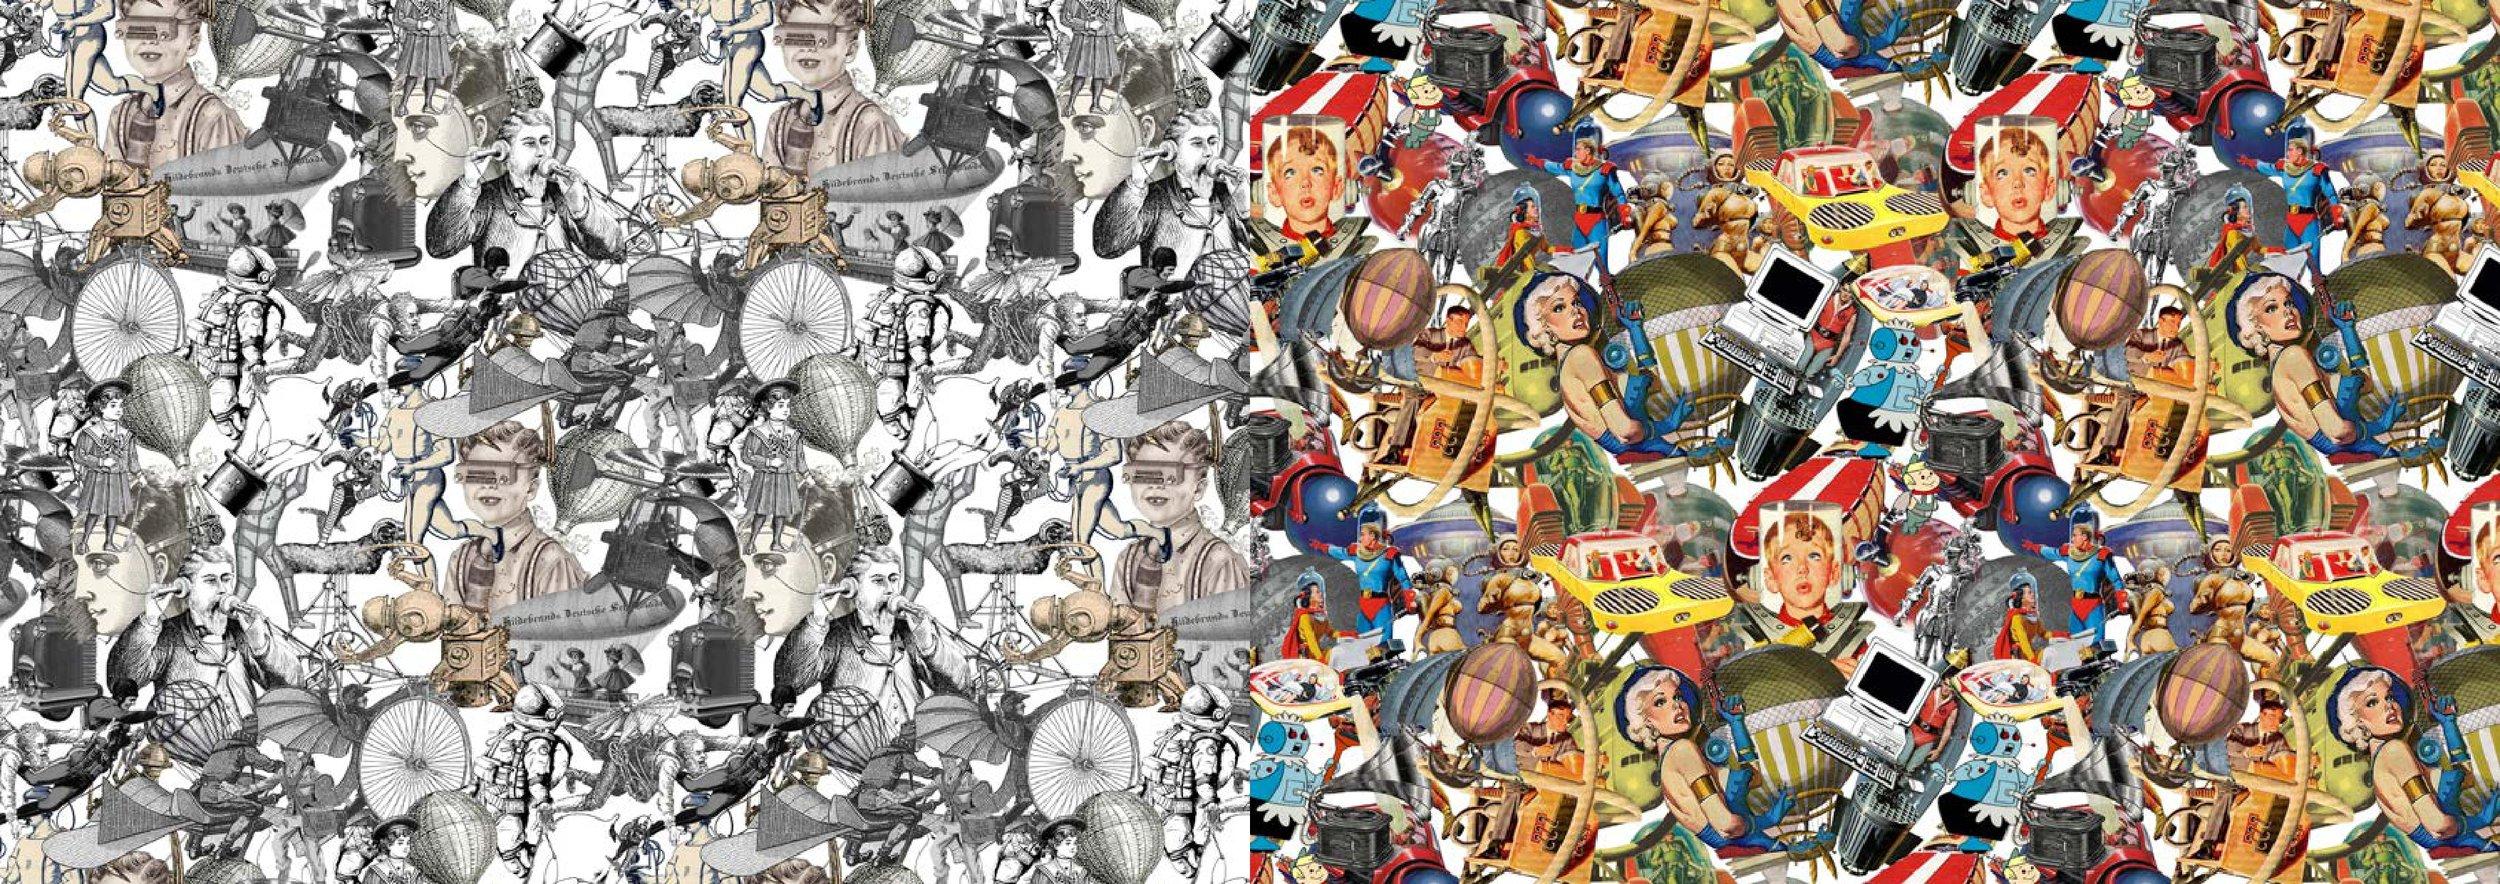 Tomorrowland(portfolio)_page-0011.jpg